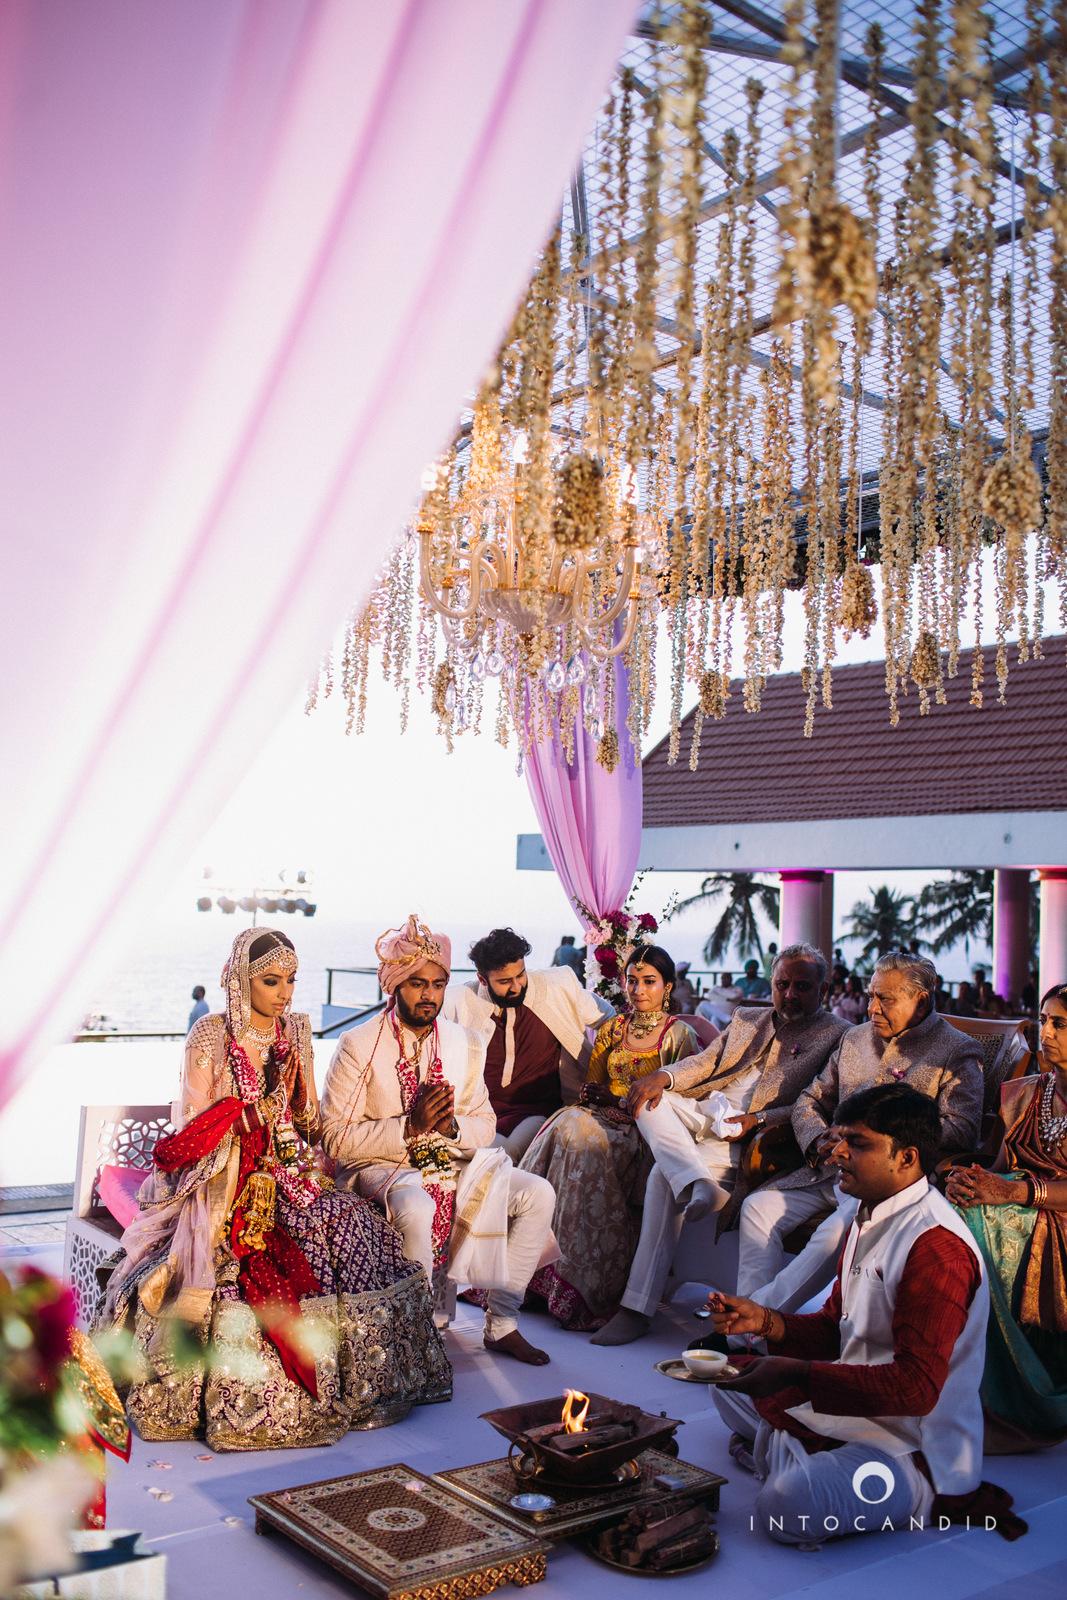 leela-kovalam-wedding-destination-indian-wedding-photography-intocandid-ra-59.jpg